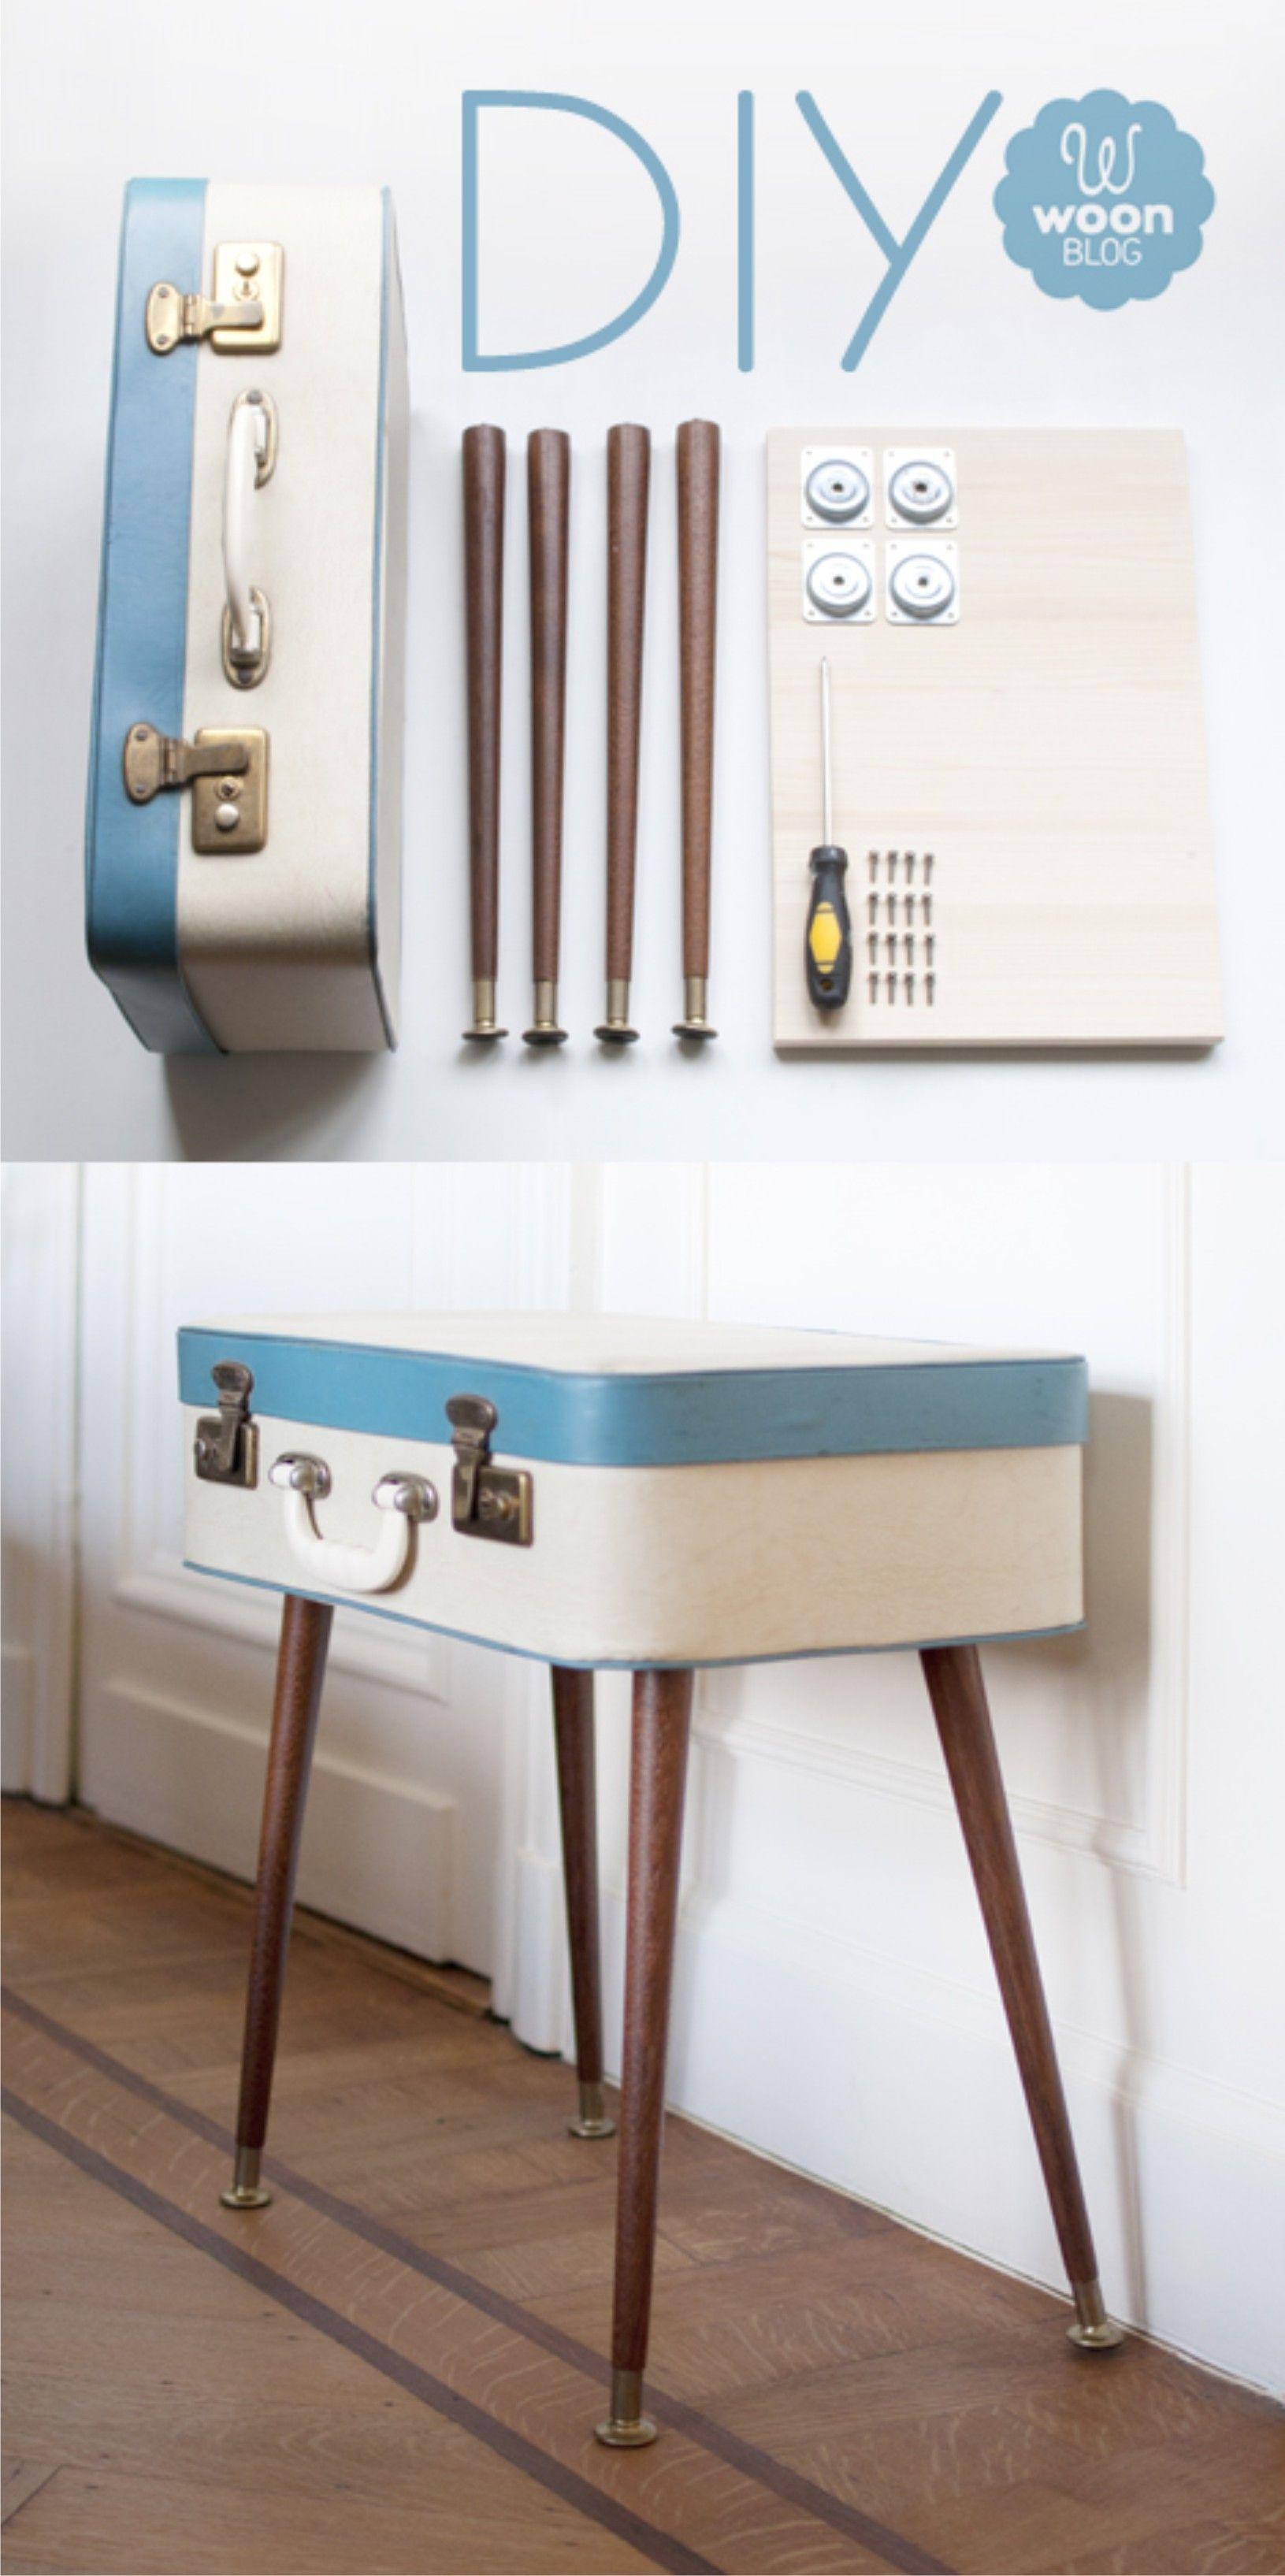 Diy suitcase table - Diy Furniture